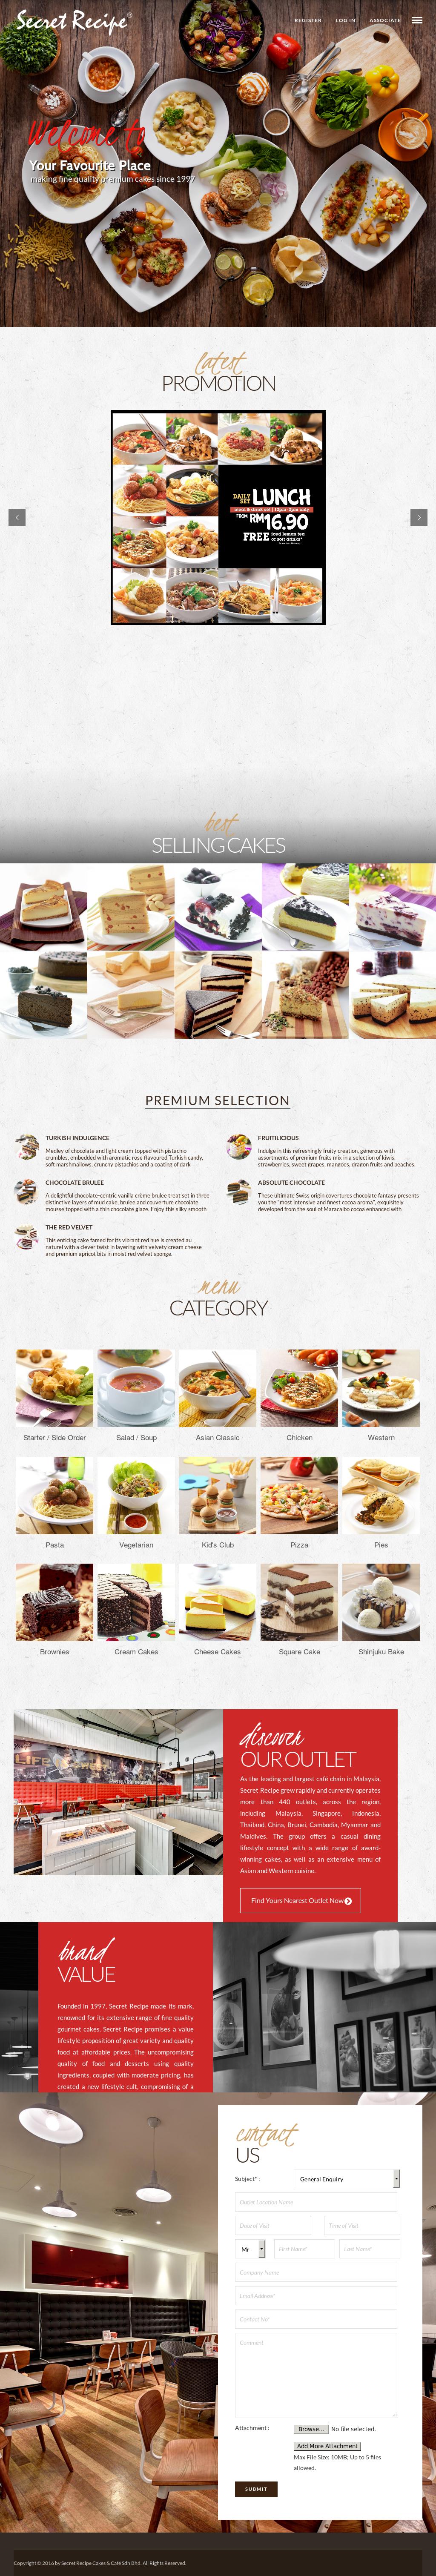 Secret Recipe Competitors, Revenue and Employees - Owler Company Profile